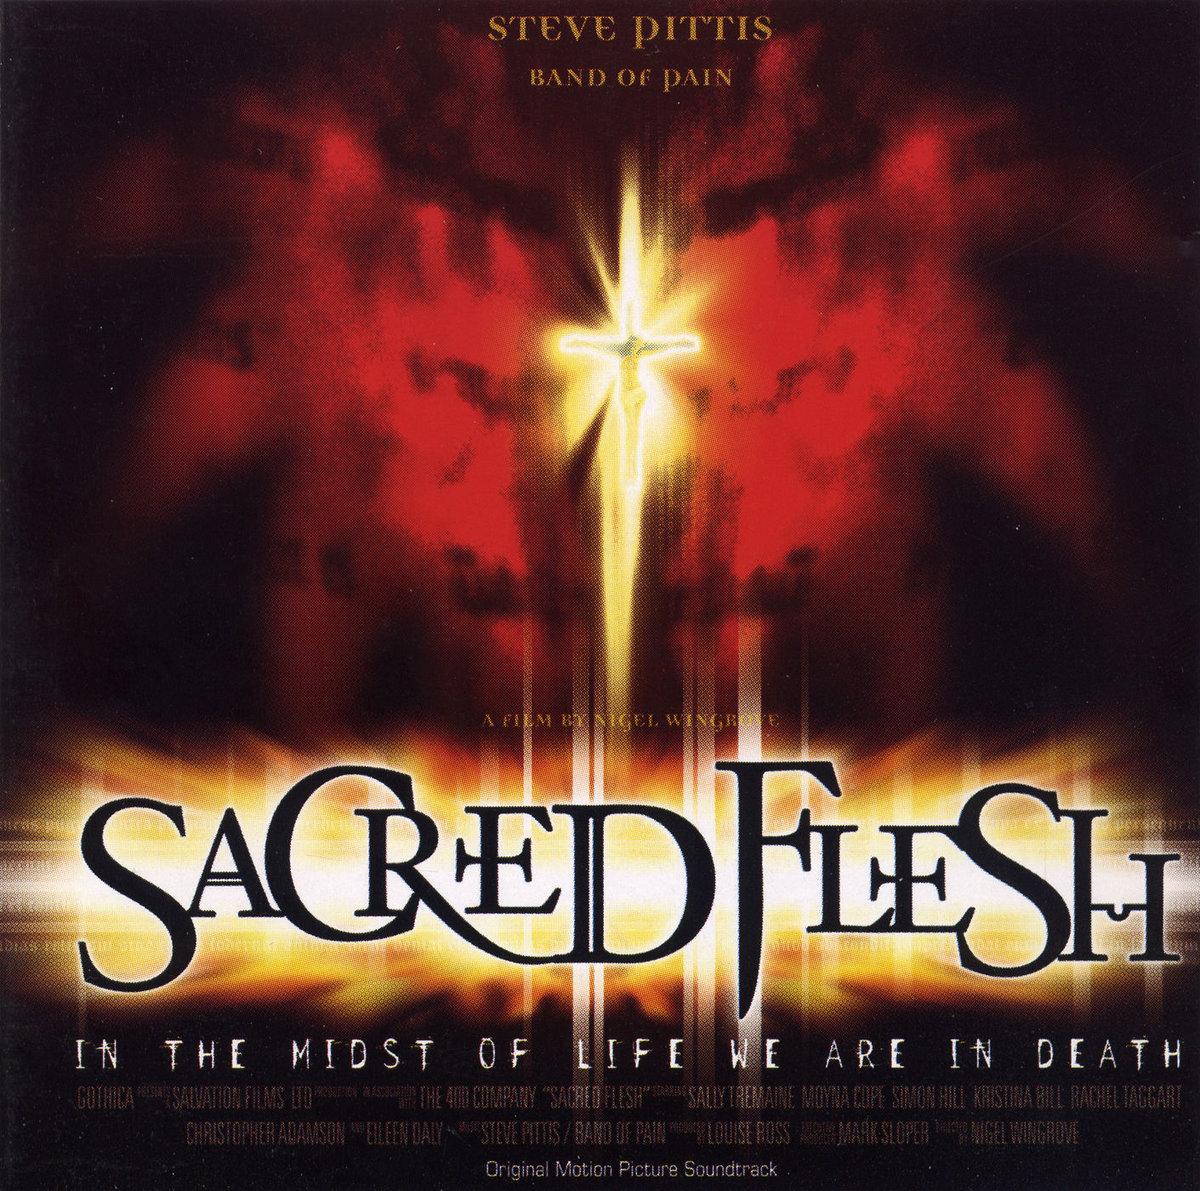 Band Of Pain - Sacred Flesh